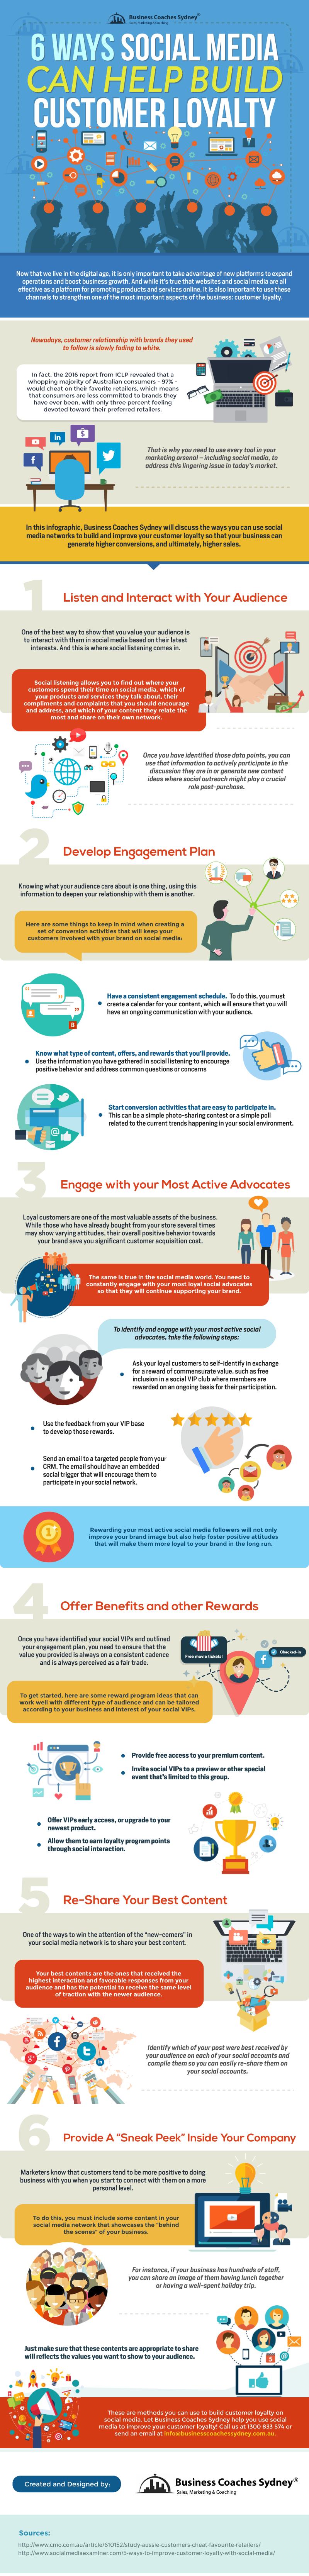 6 Ways Social Media Can Help Build Customer Loyalty [Infographic] | Social Media Today